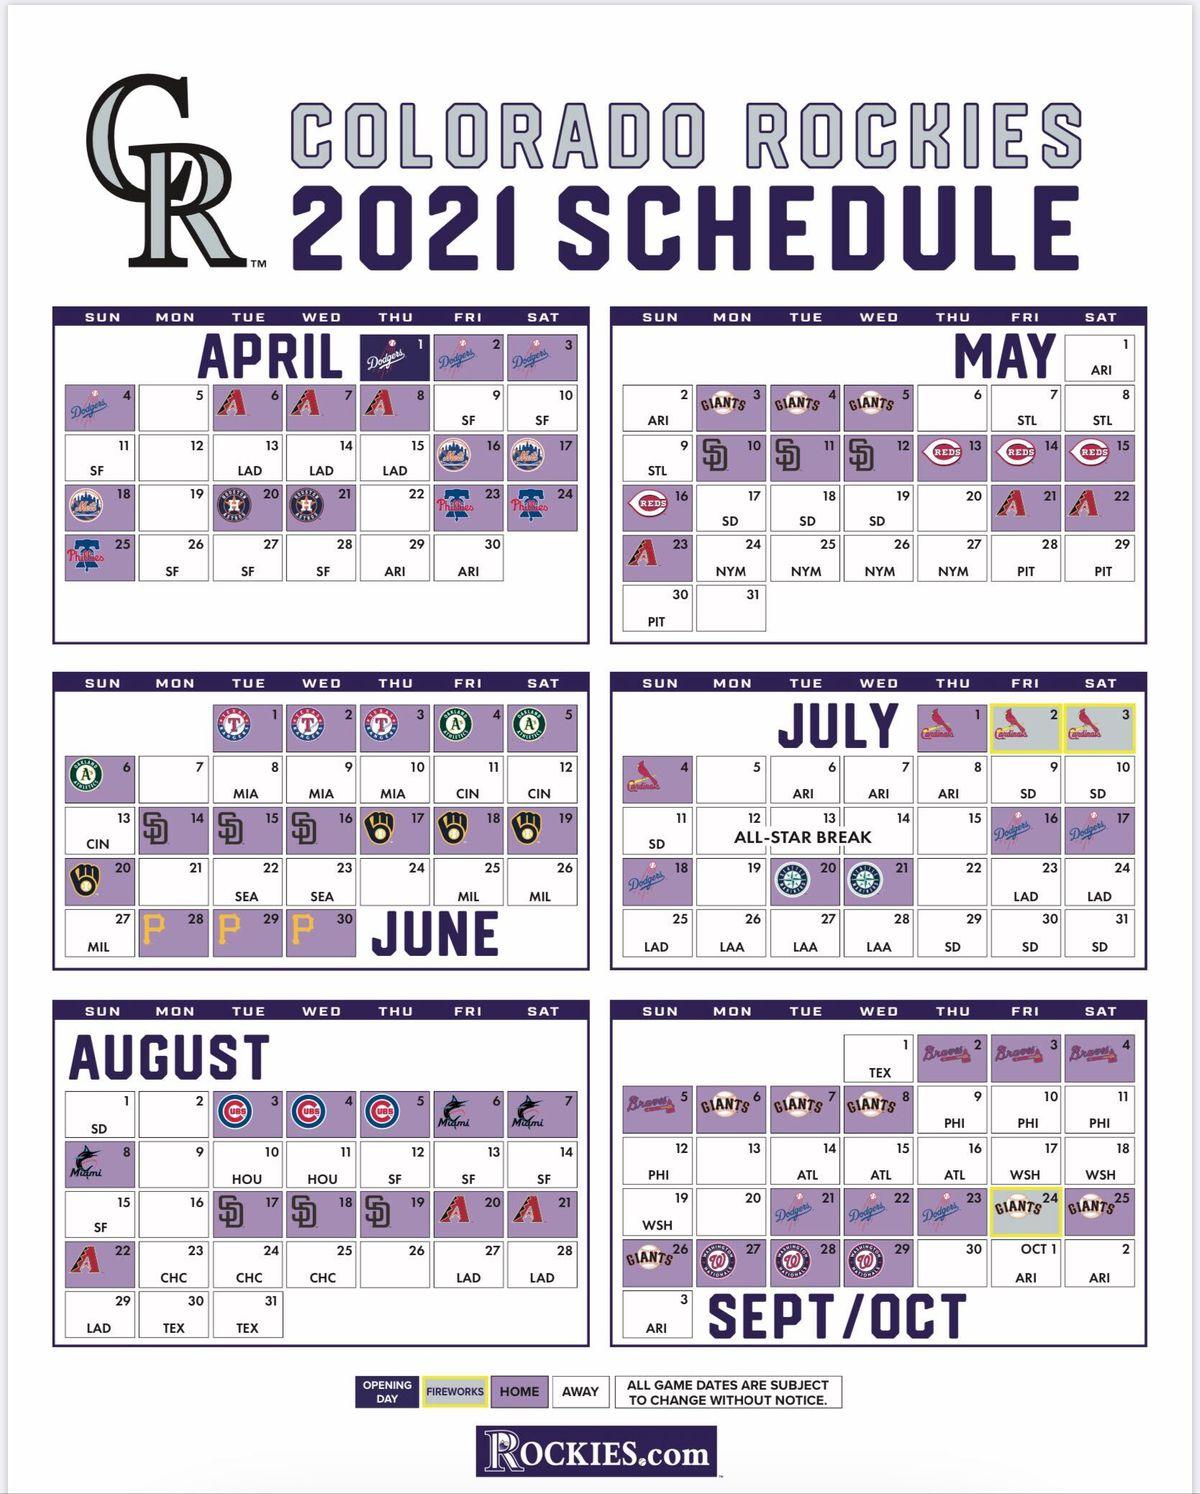 MLB Releases 2021 Schedule Purple Row